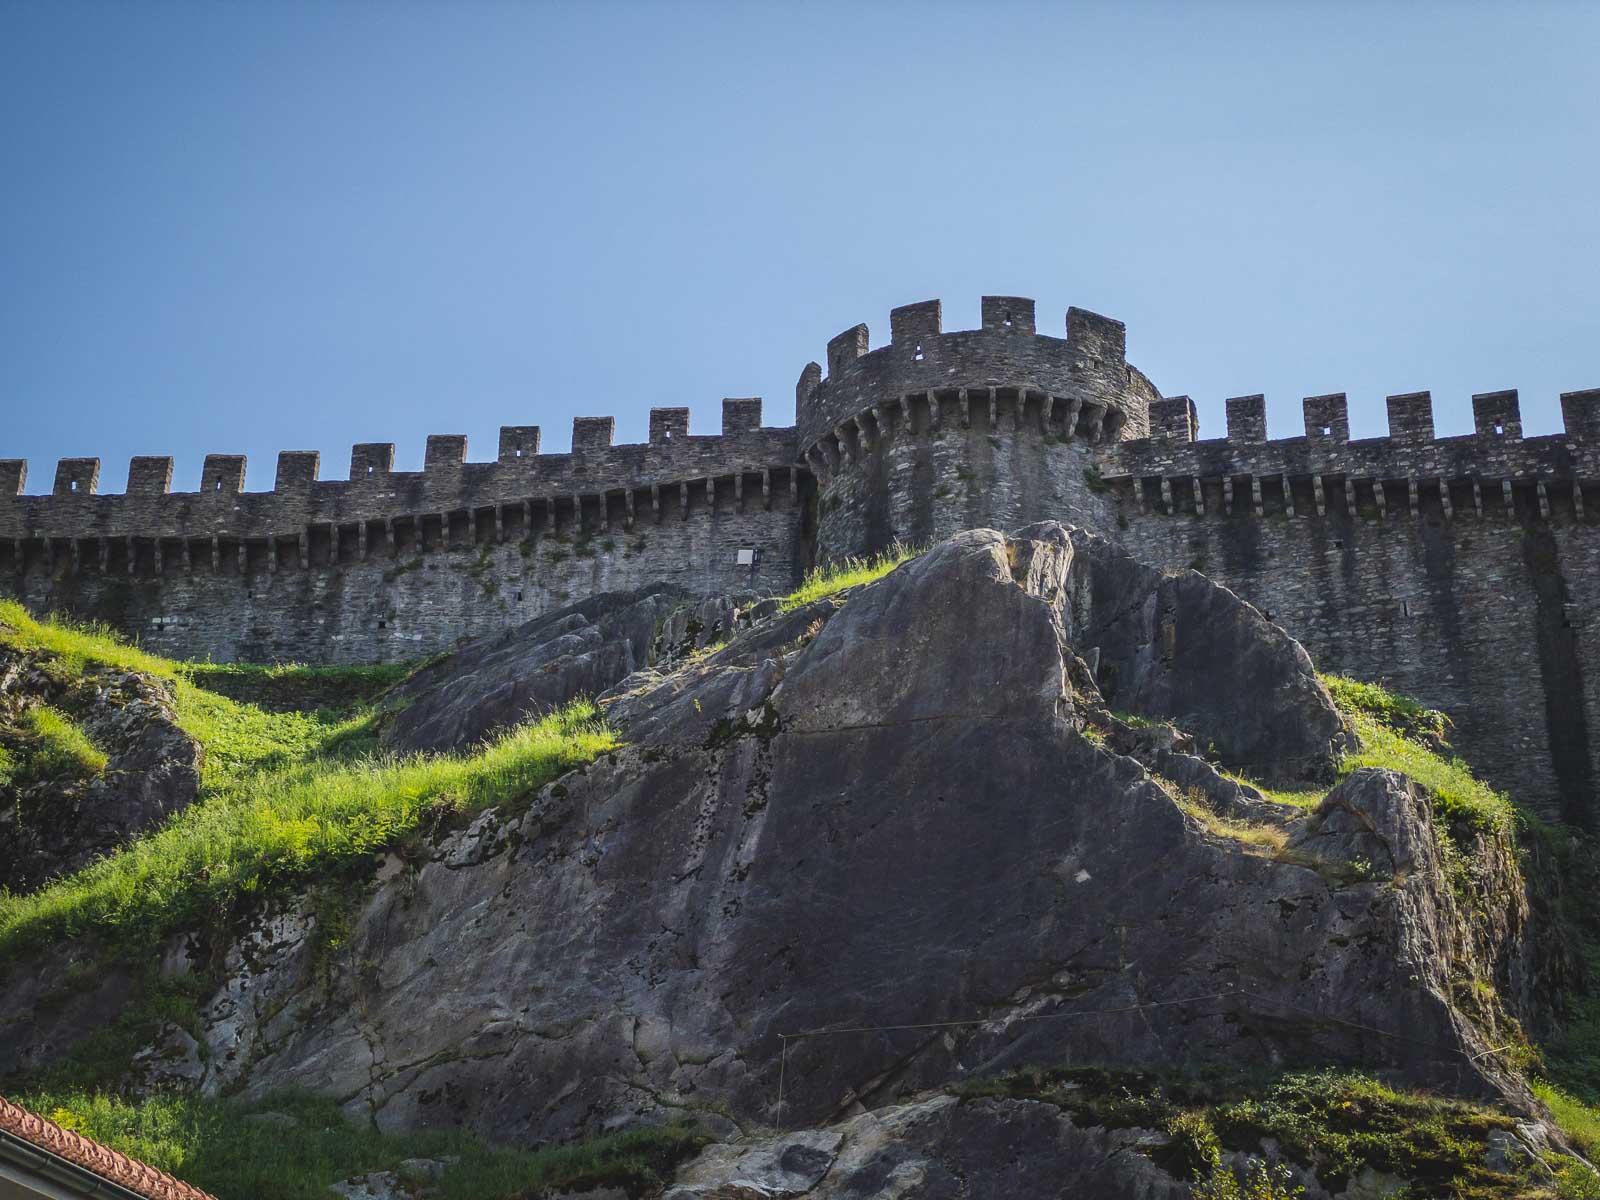 Bellinzona Castles in Ticino